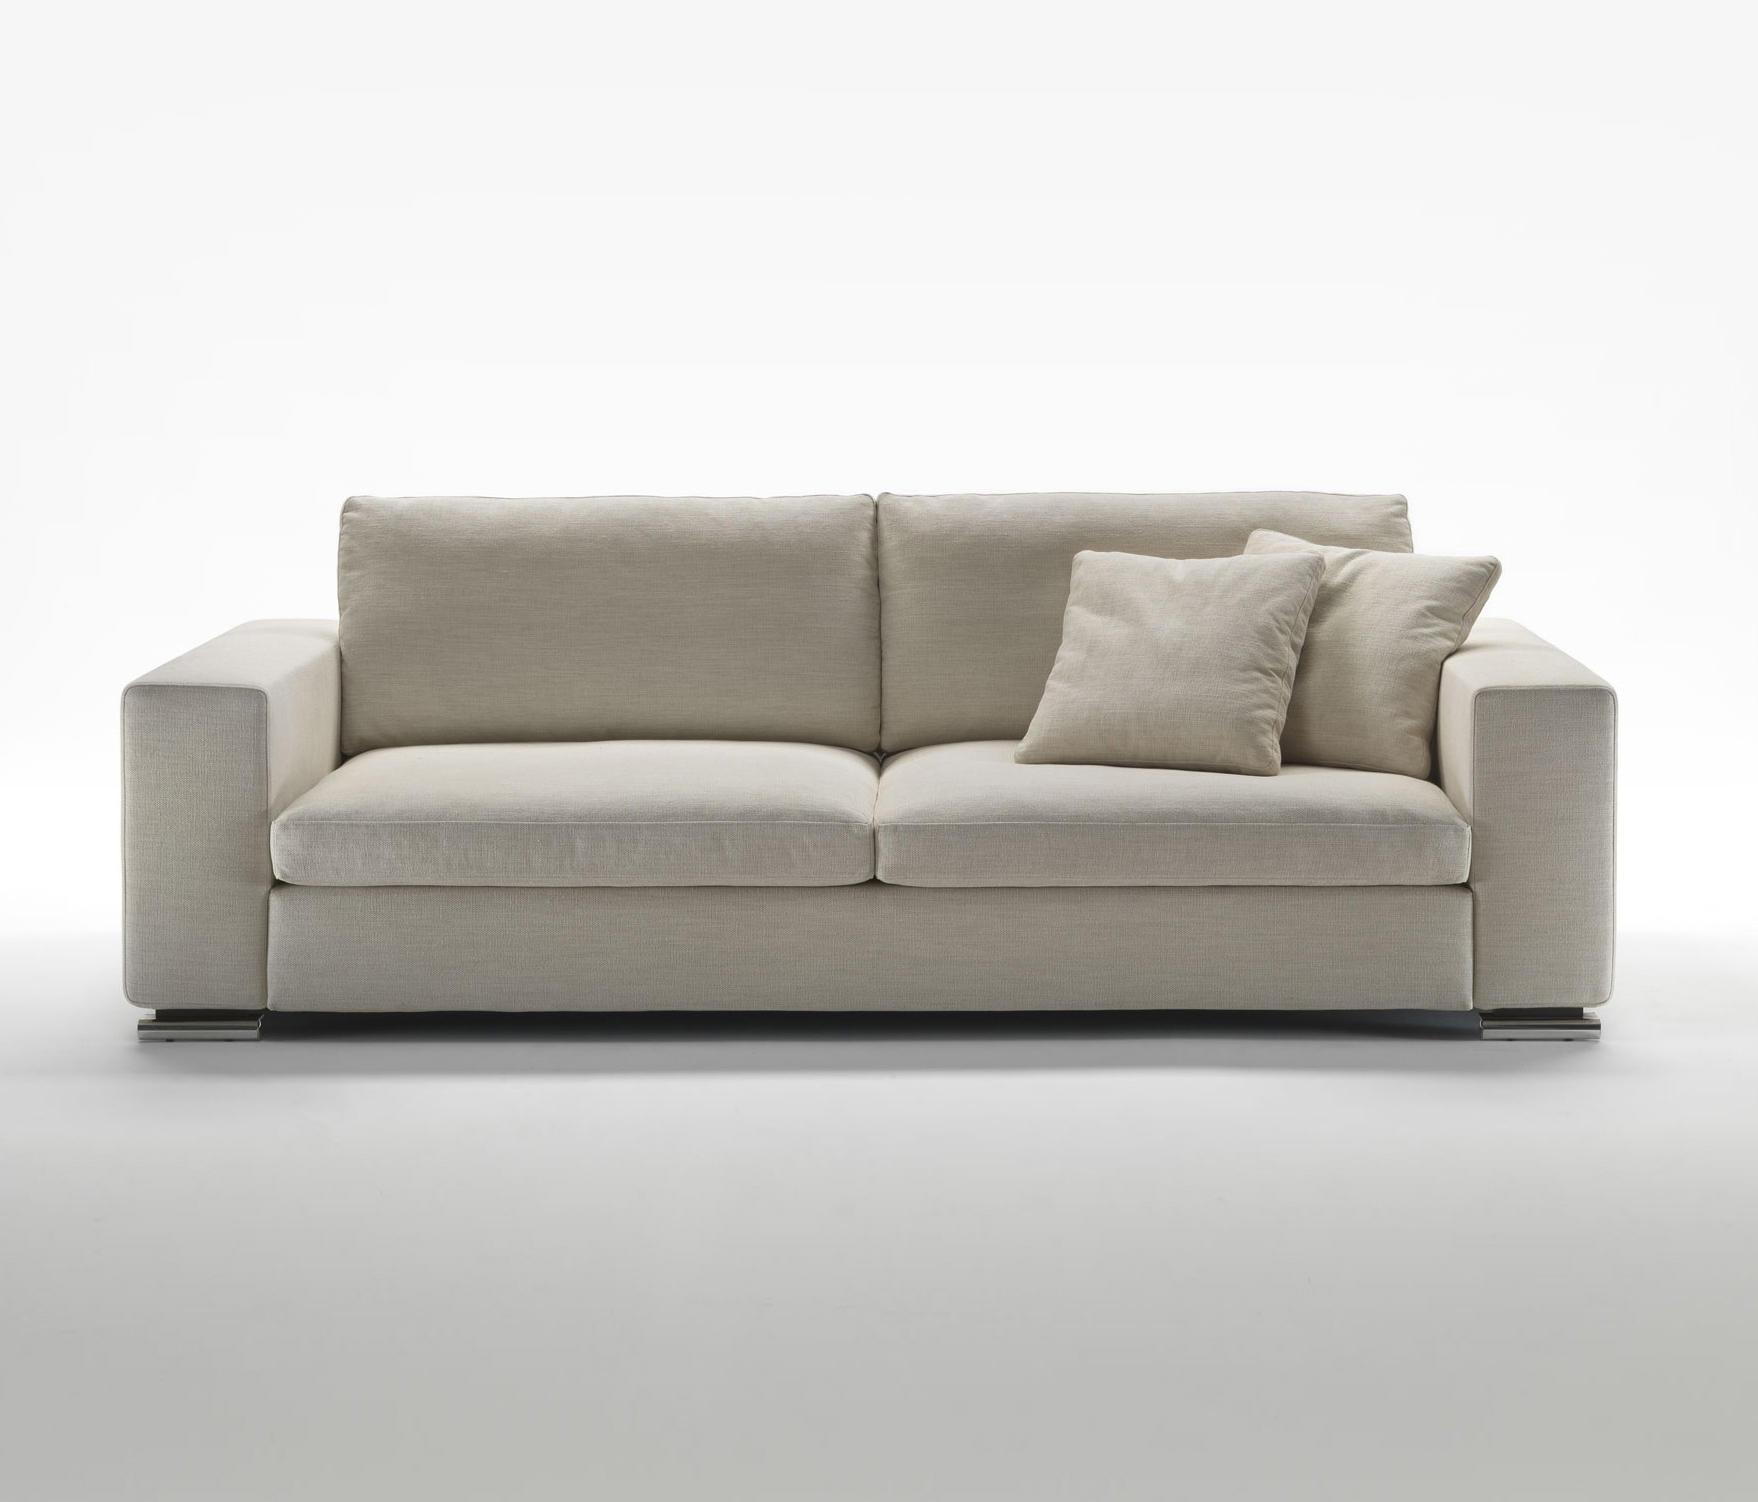 SOFA - Sofas From Marelli